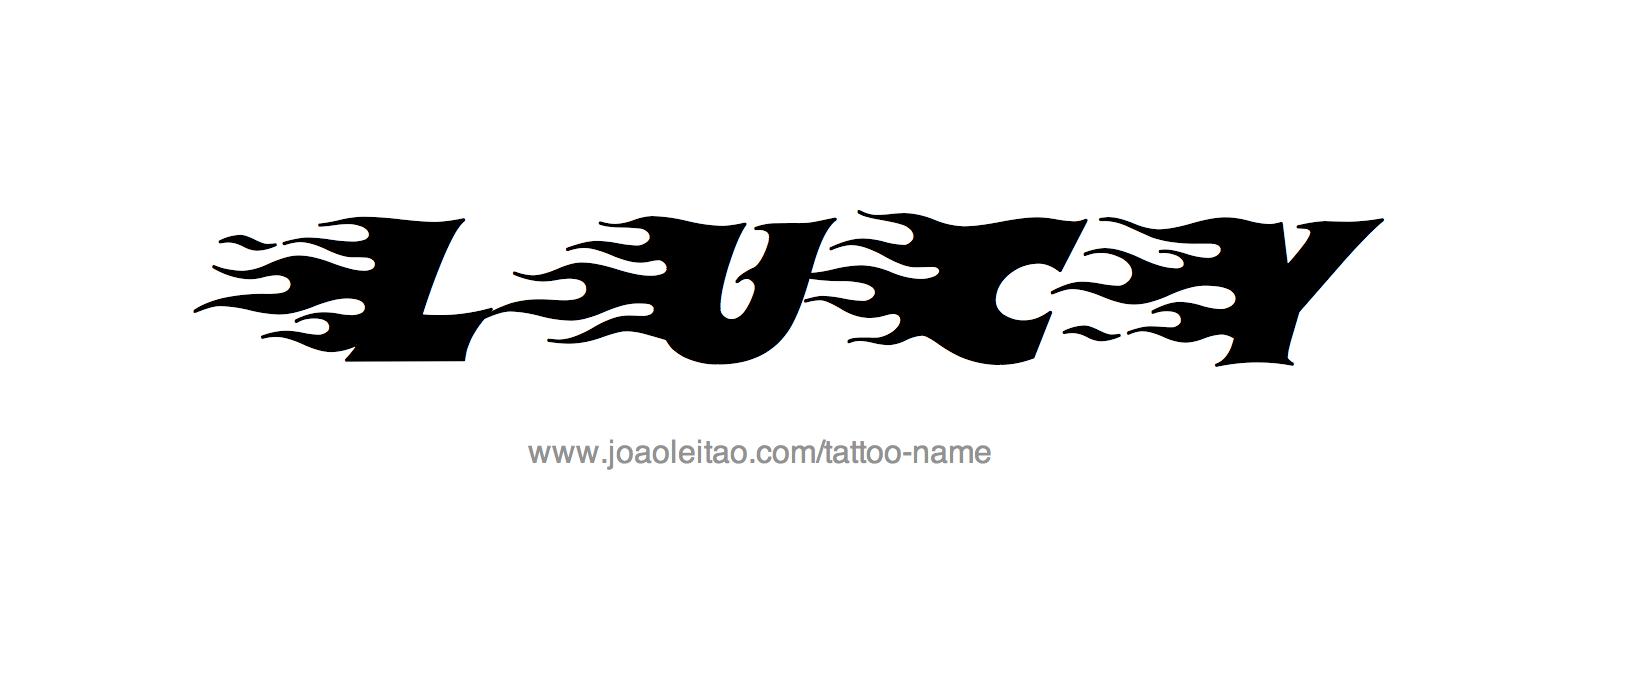 tattoo design female name lucy 23 png. Black Bedroom Furniture Sets. Home Design Ideas